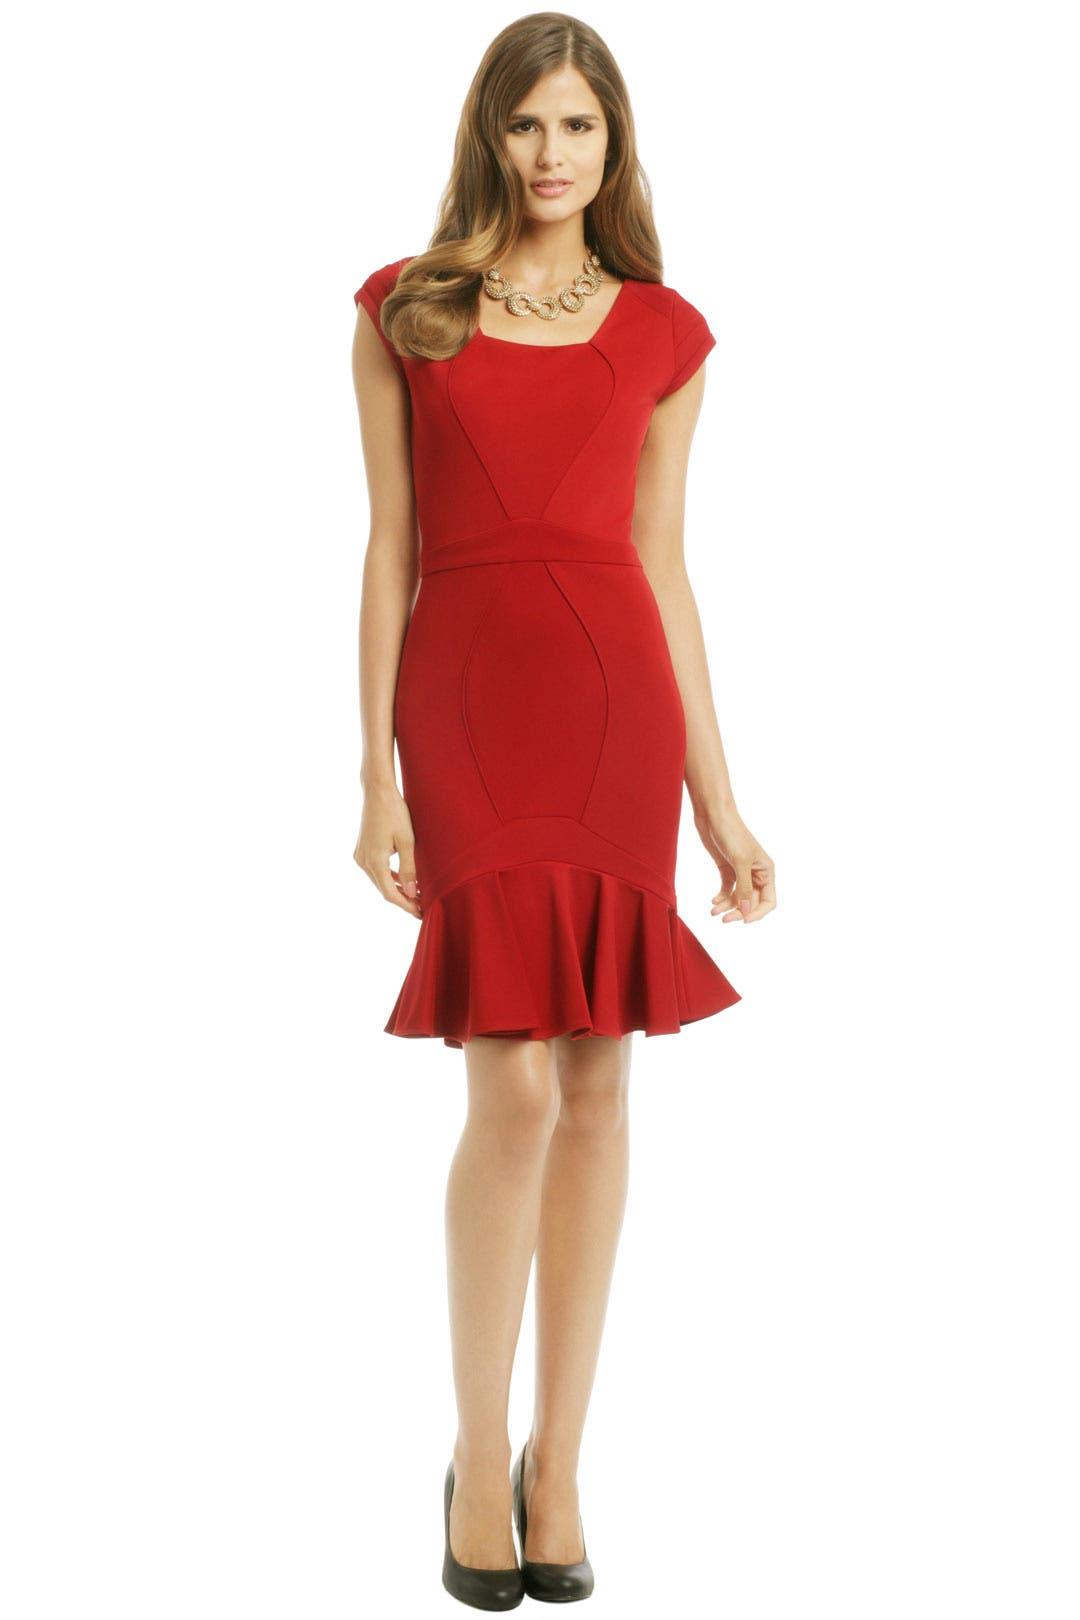 Red Snapper Dress by ZAC Zac Posen